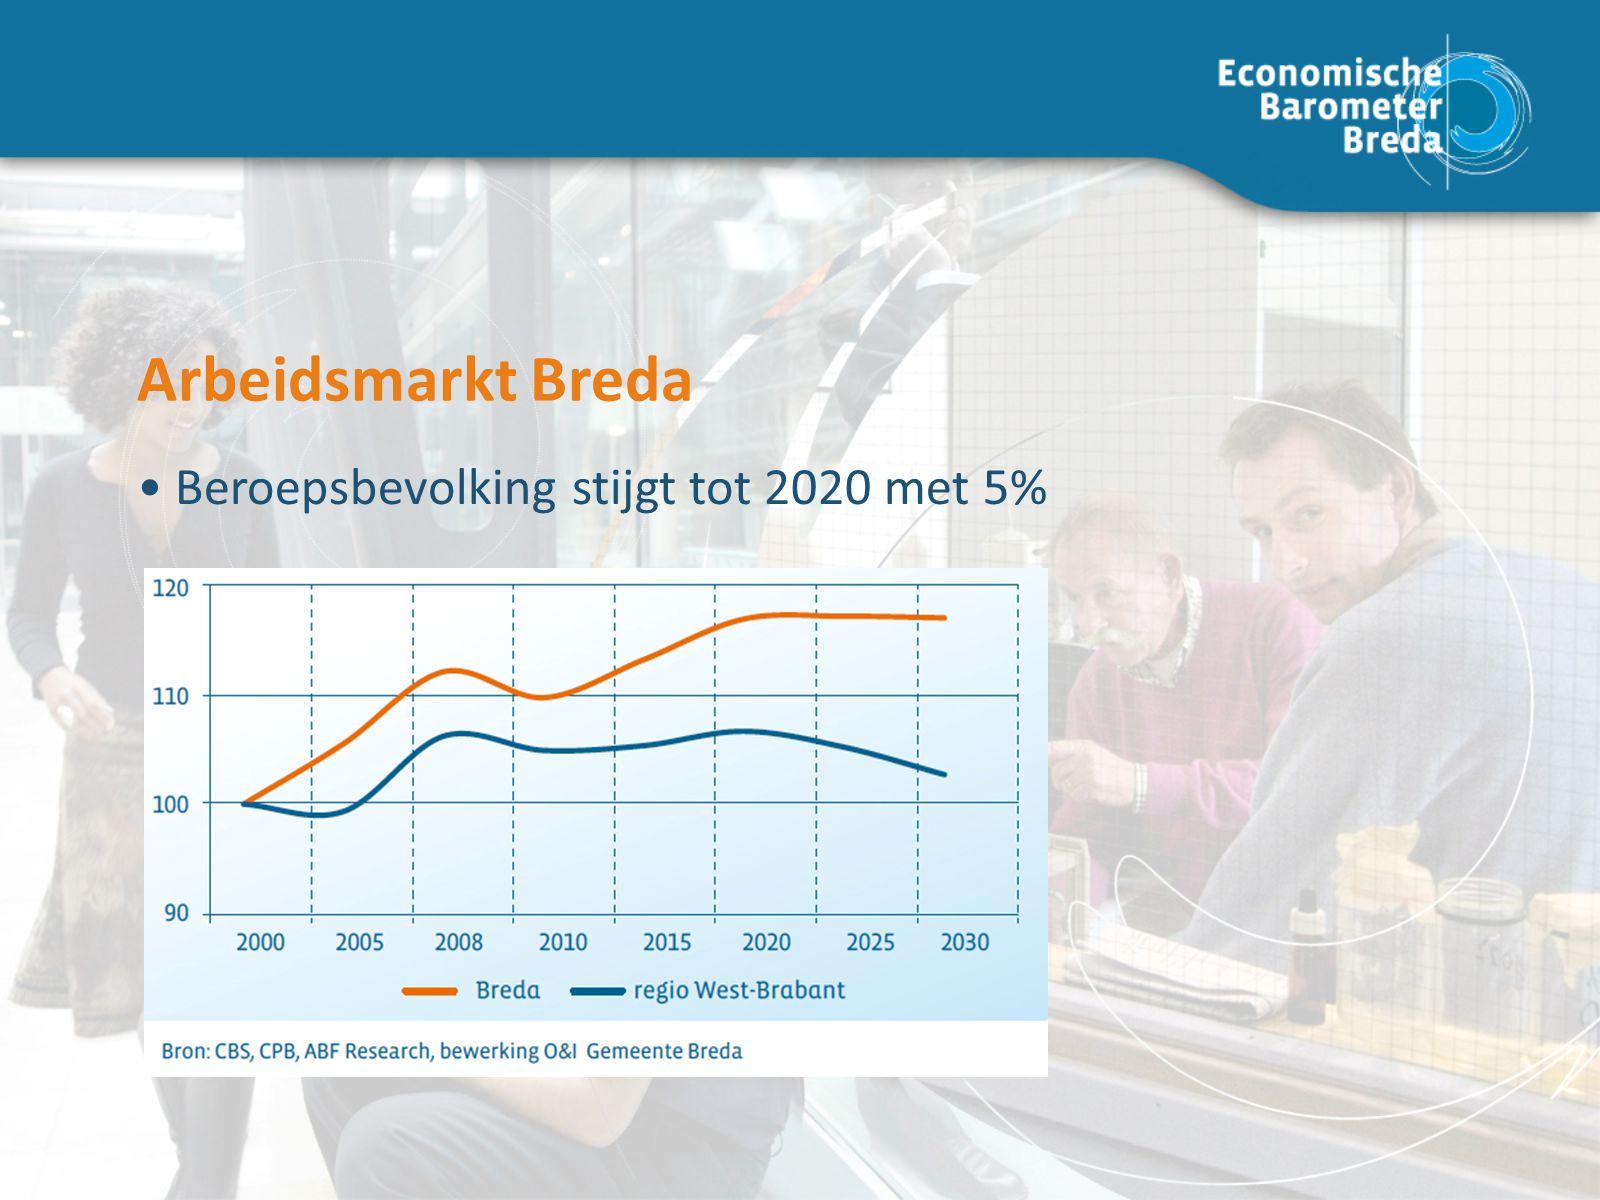 Arbeidsmarkt Breda Beroepsbevolking stijgt tot 2020 met 5% Arbeidsmarkt Breda